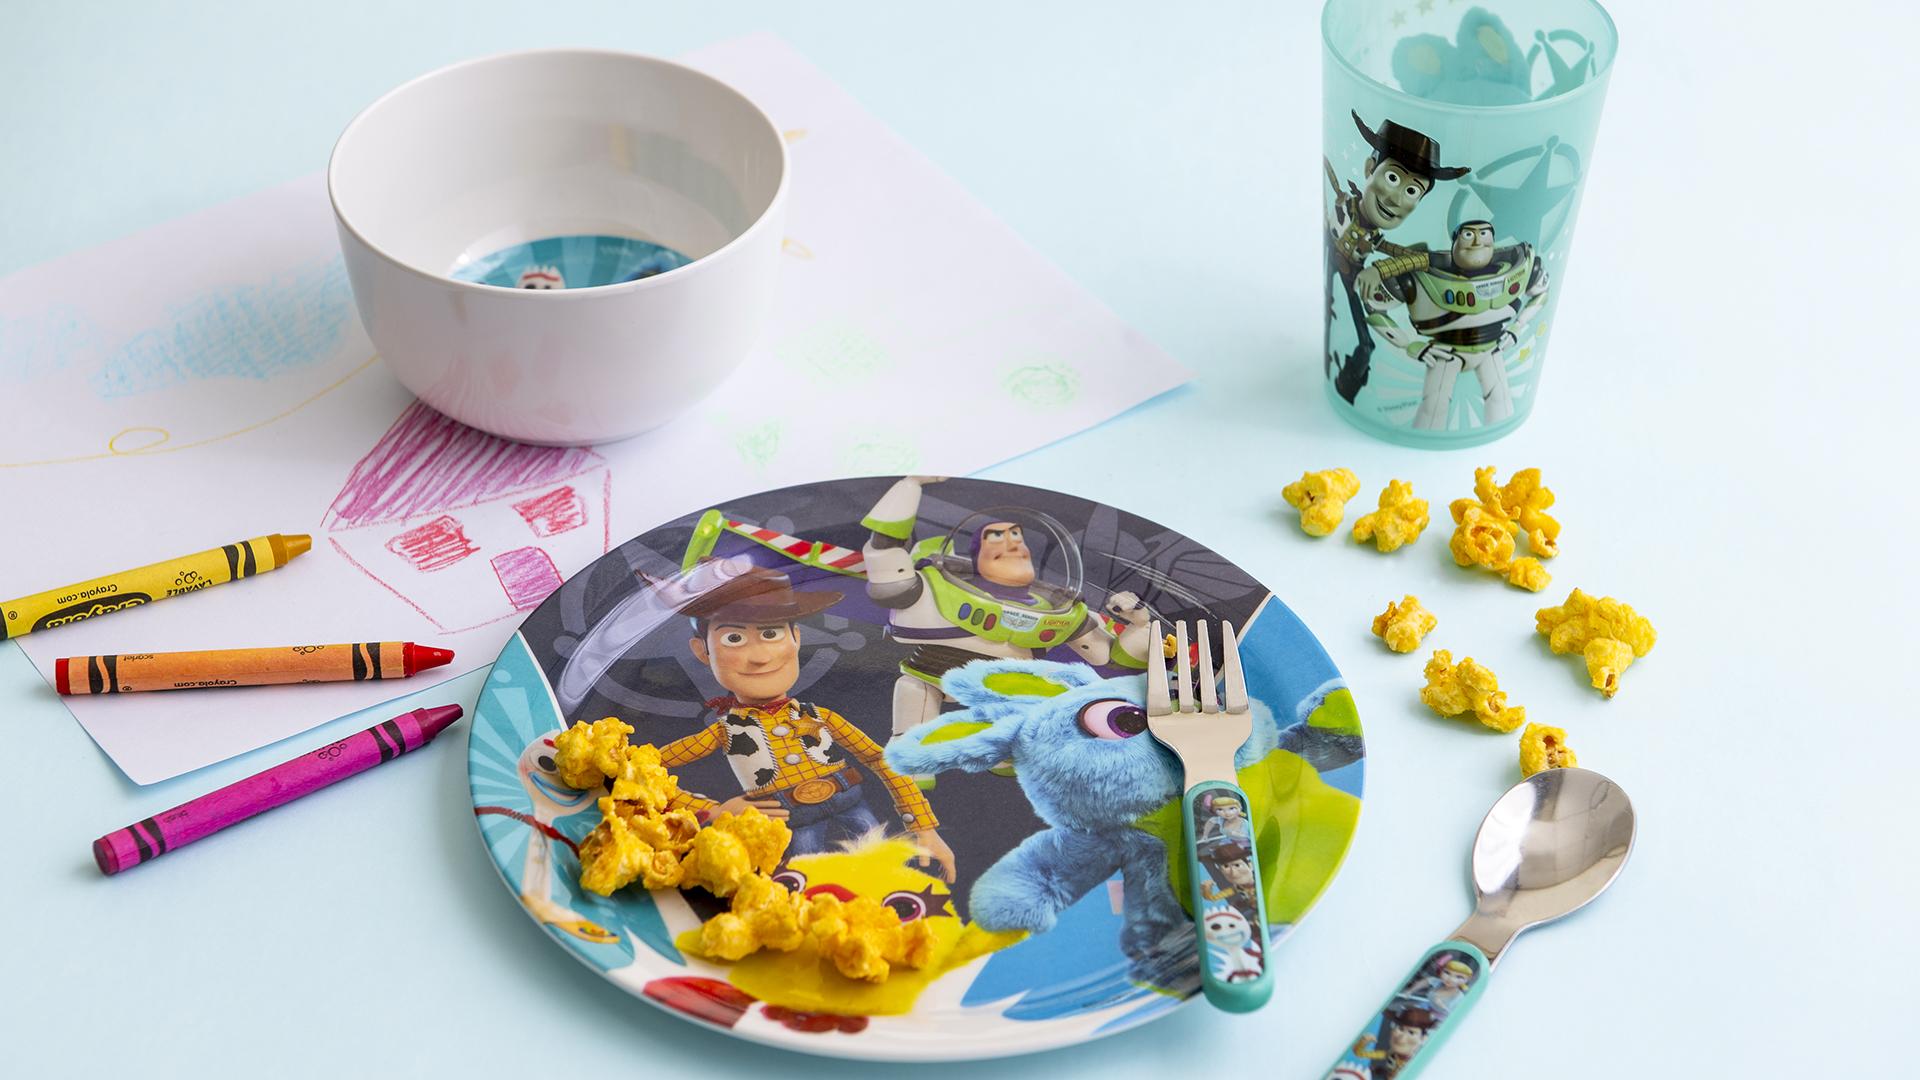 Disney Pixar Dinnerware Set, Woody, Buzz and Friends, 5-piece set slideshow image 4